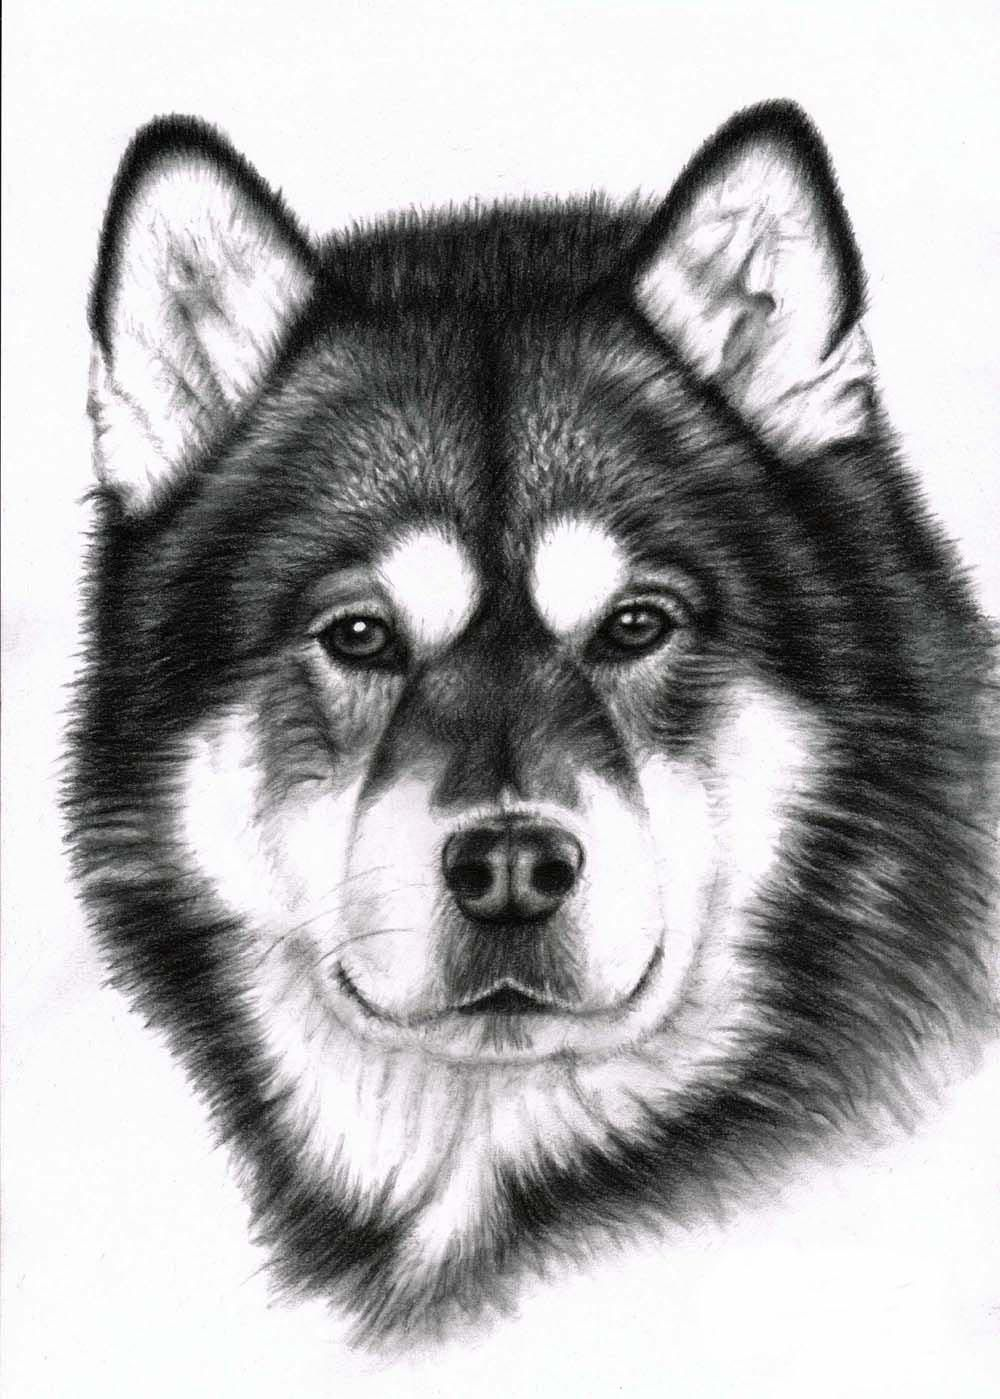 Alaskan Malamute Charcoal Www Arts And Dogs De Pintura Perro Silueta De Perro Revistas De Arte